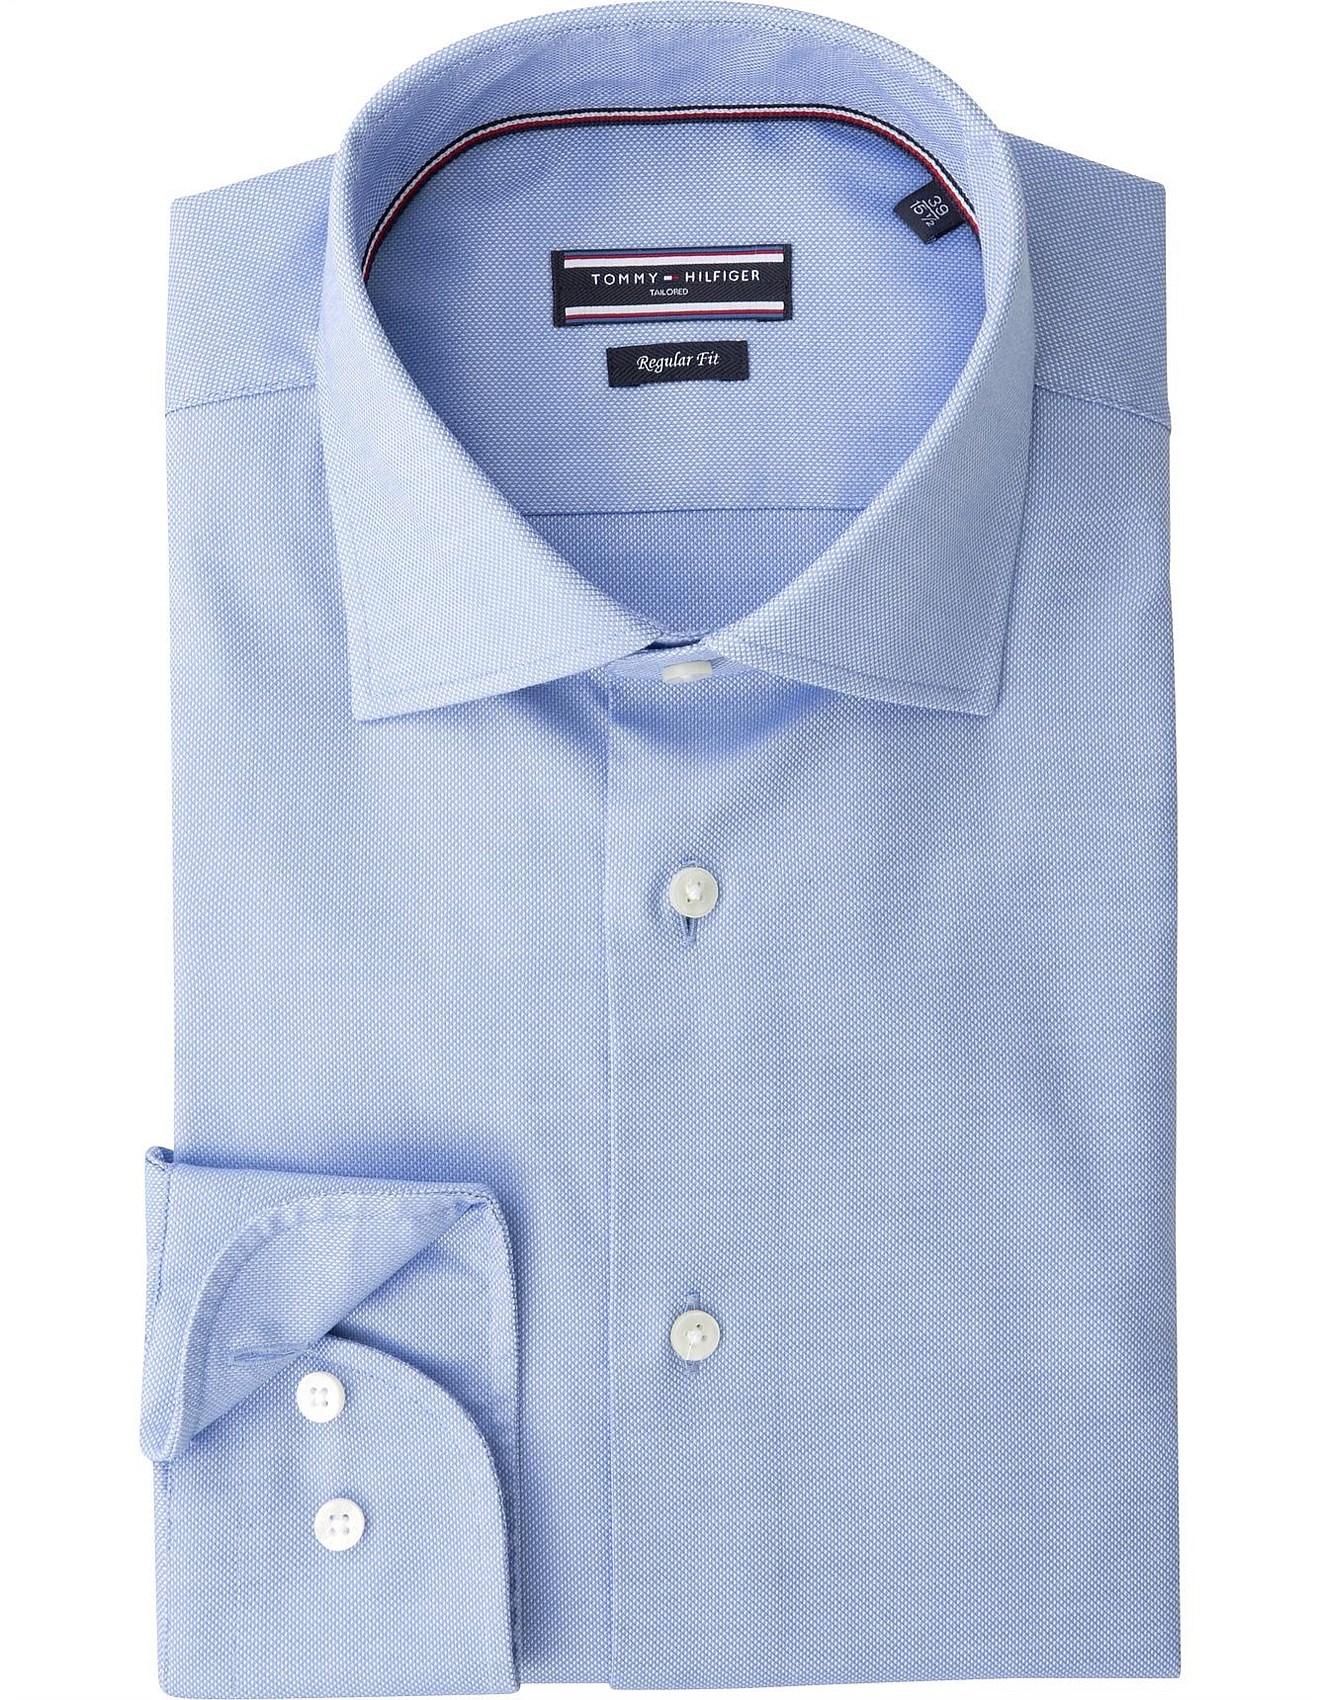 57ad0388 Slim Fit Dress Shirts | Men's Dress Shirts | David Jones - CORE ...